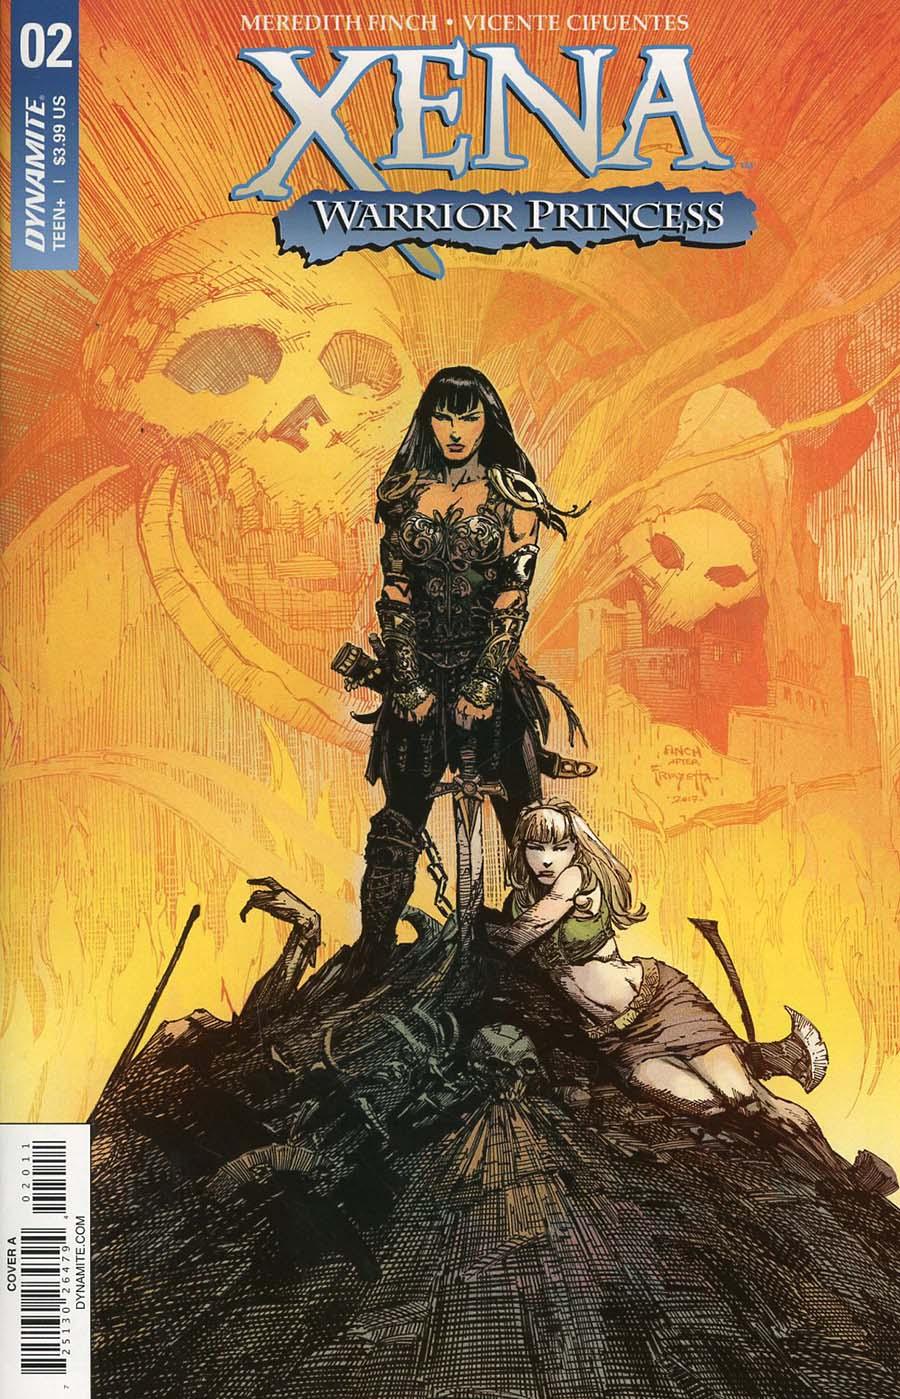 Xena Vol 2 #2 Cover A Regular David Finch Cover